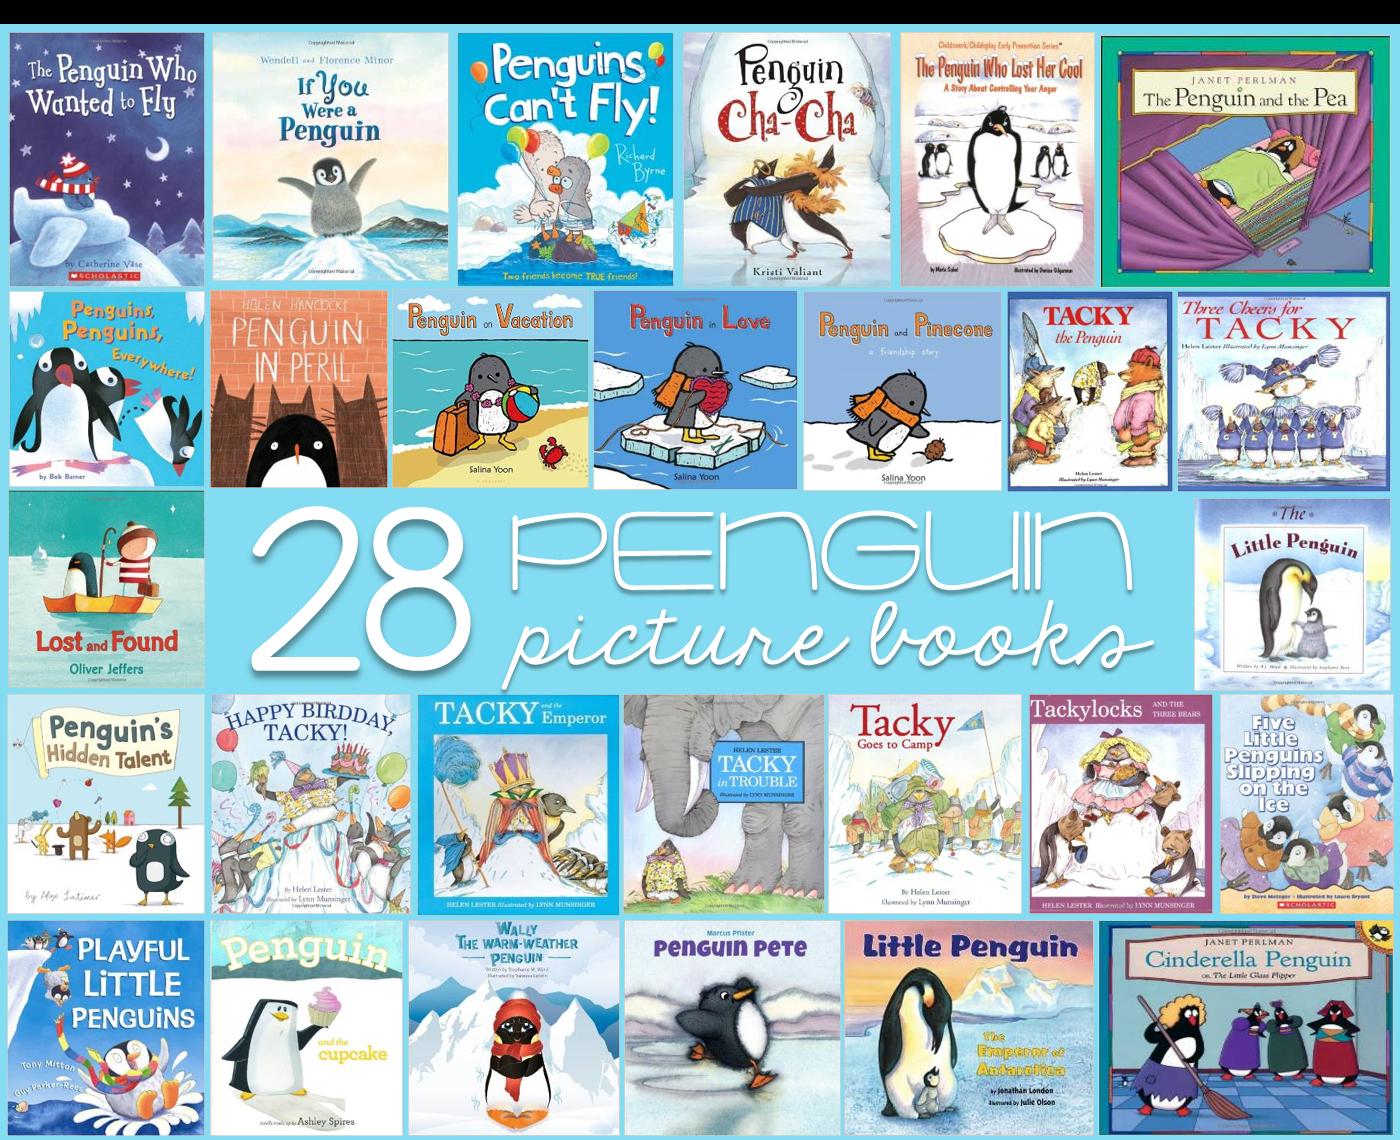 Warm weather penguins